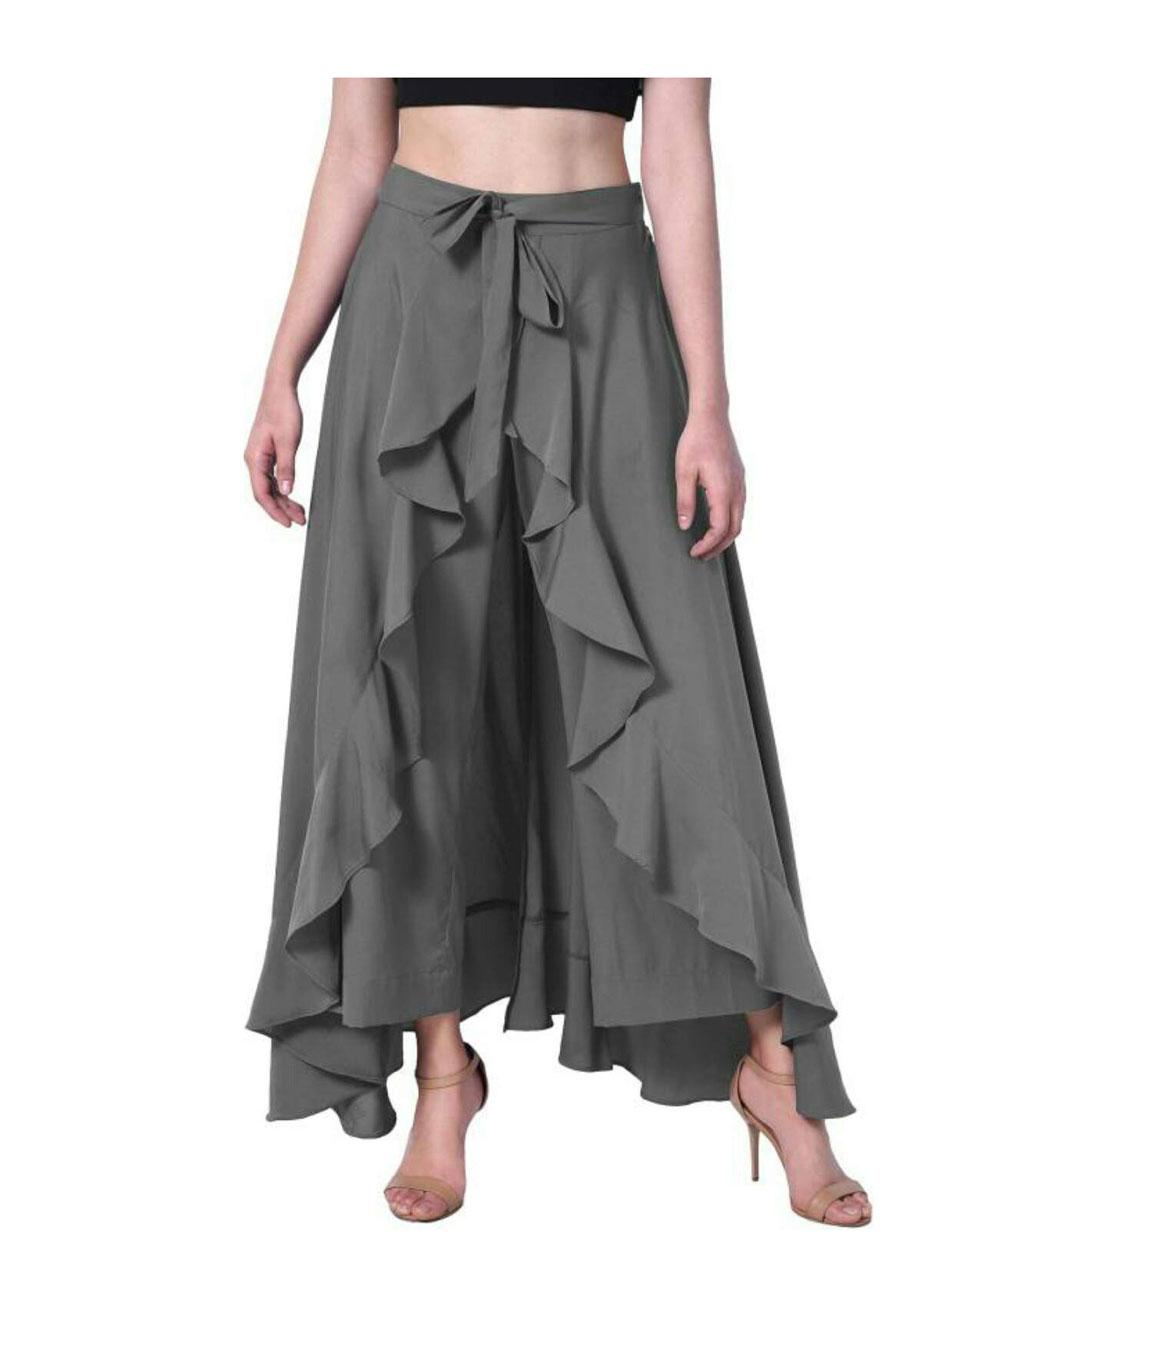 Women`s Layered/Ruffle Black Palazzo with One Waist Tie Band(grey)